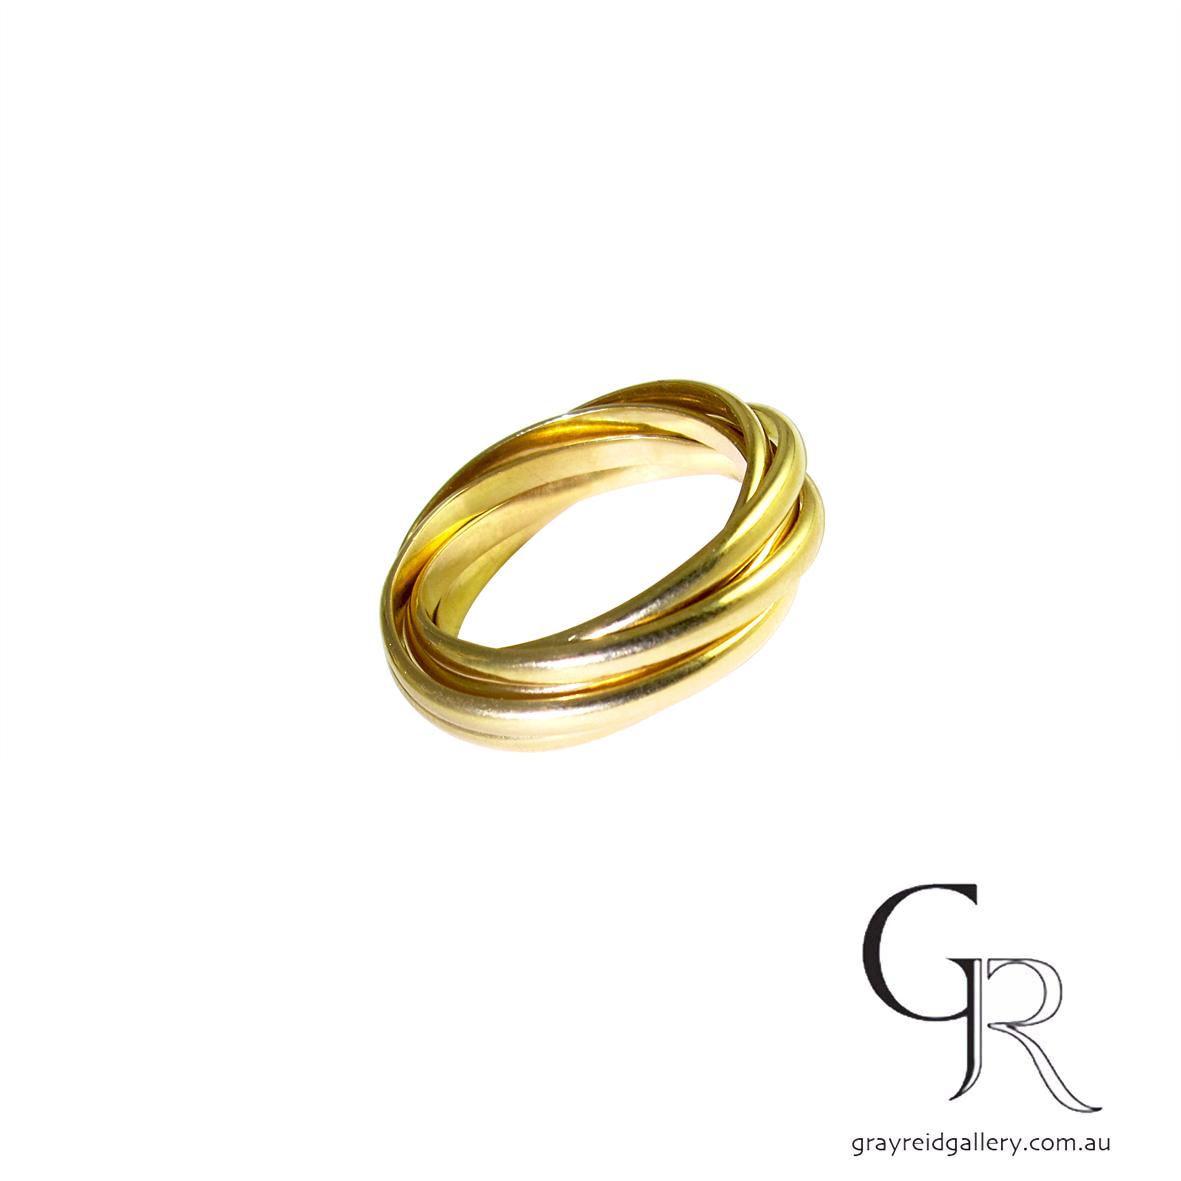 Custom made russian wedder mens gold band gray reid gallery.jpg